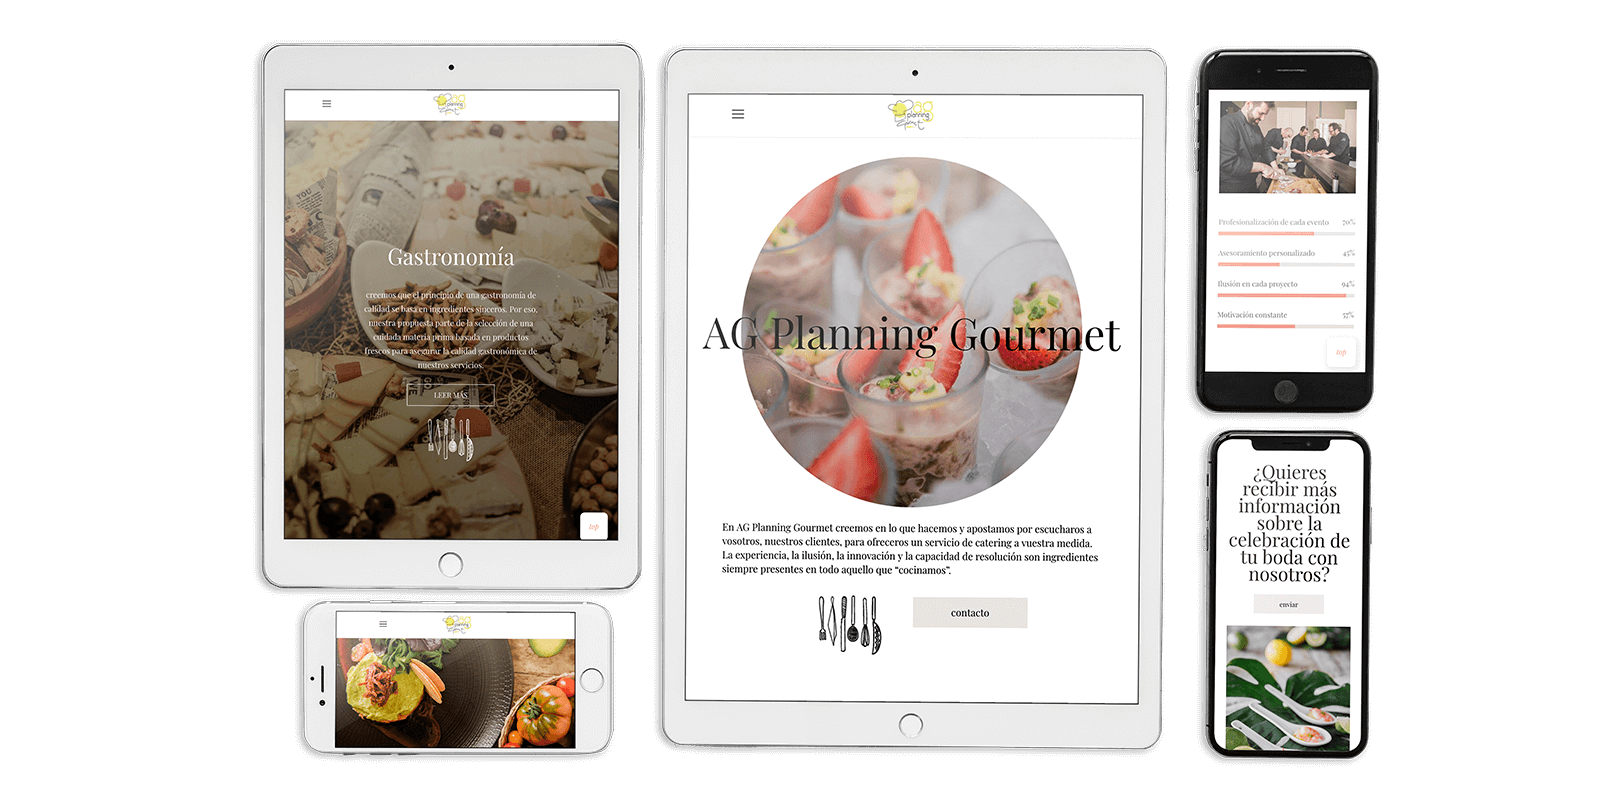 Diseño Web para el catering Ag Planning Gourmet en Tarragona